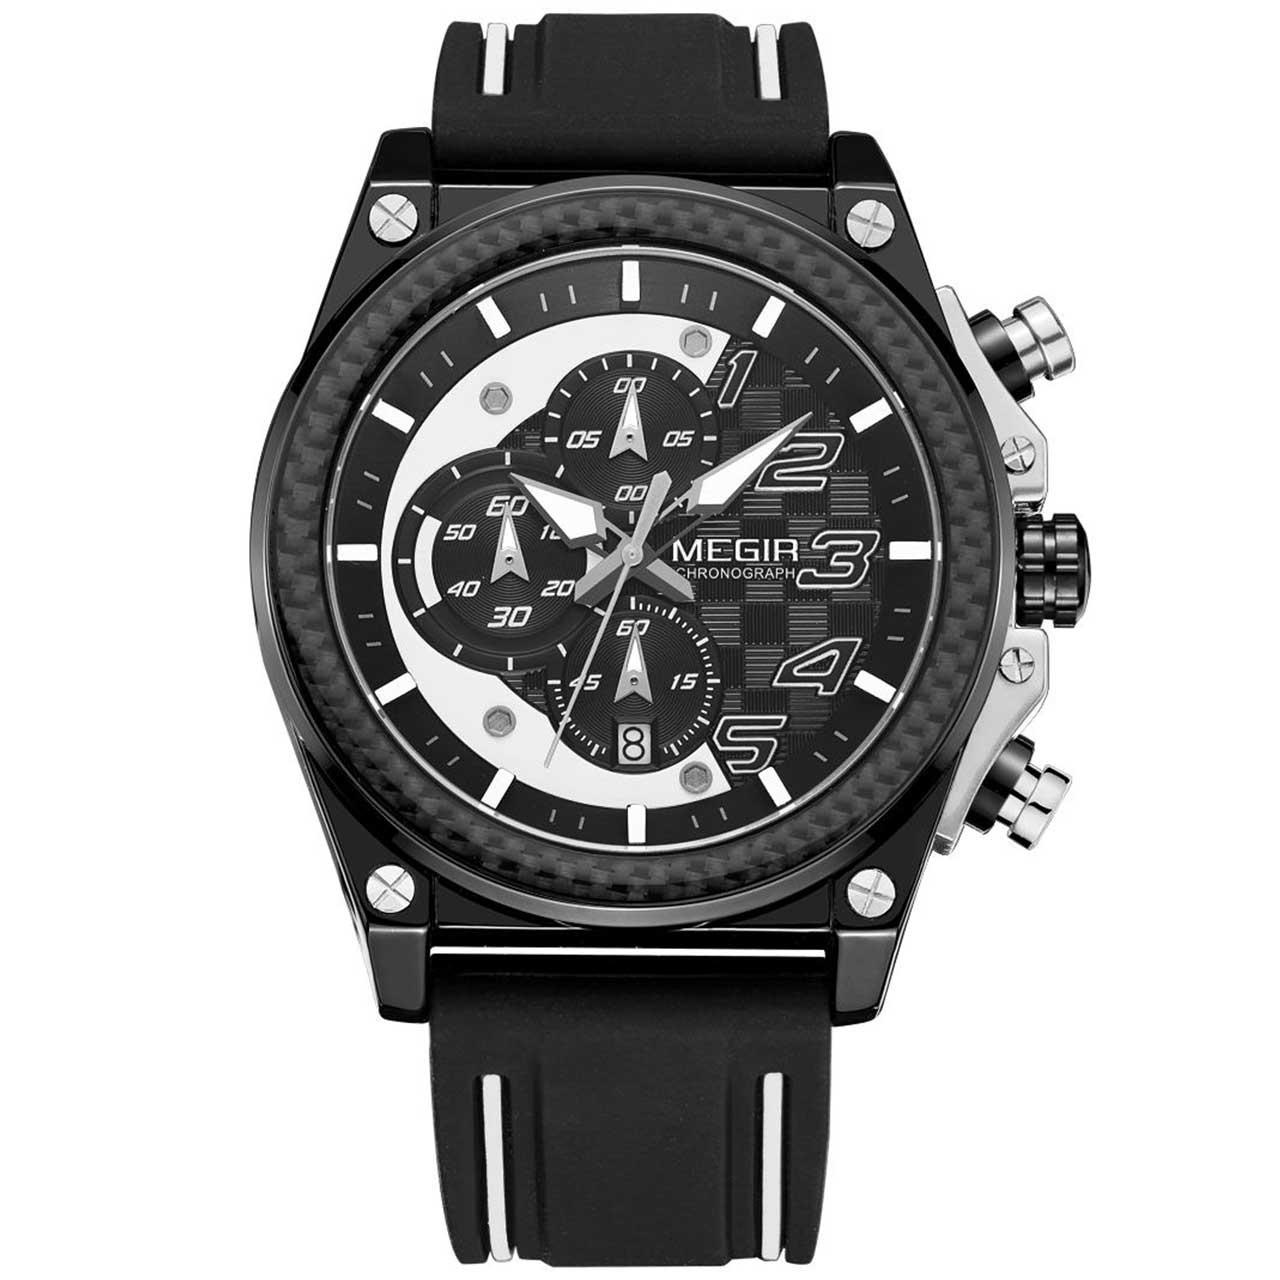 ساعت مچی عقربه ای مردانه مگیر مدل MN2051G-BK-1N7